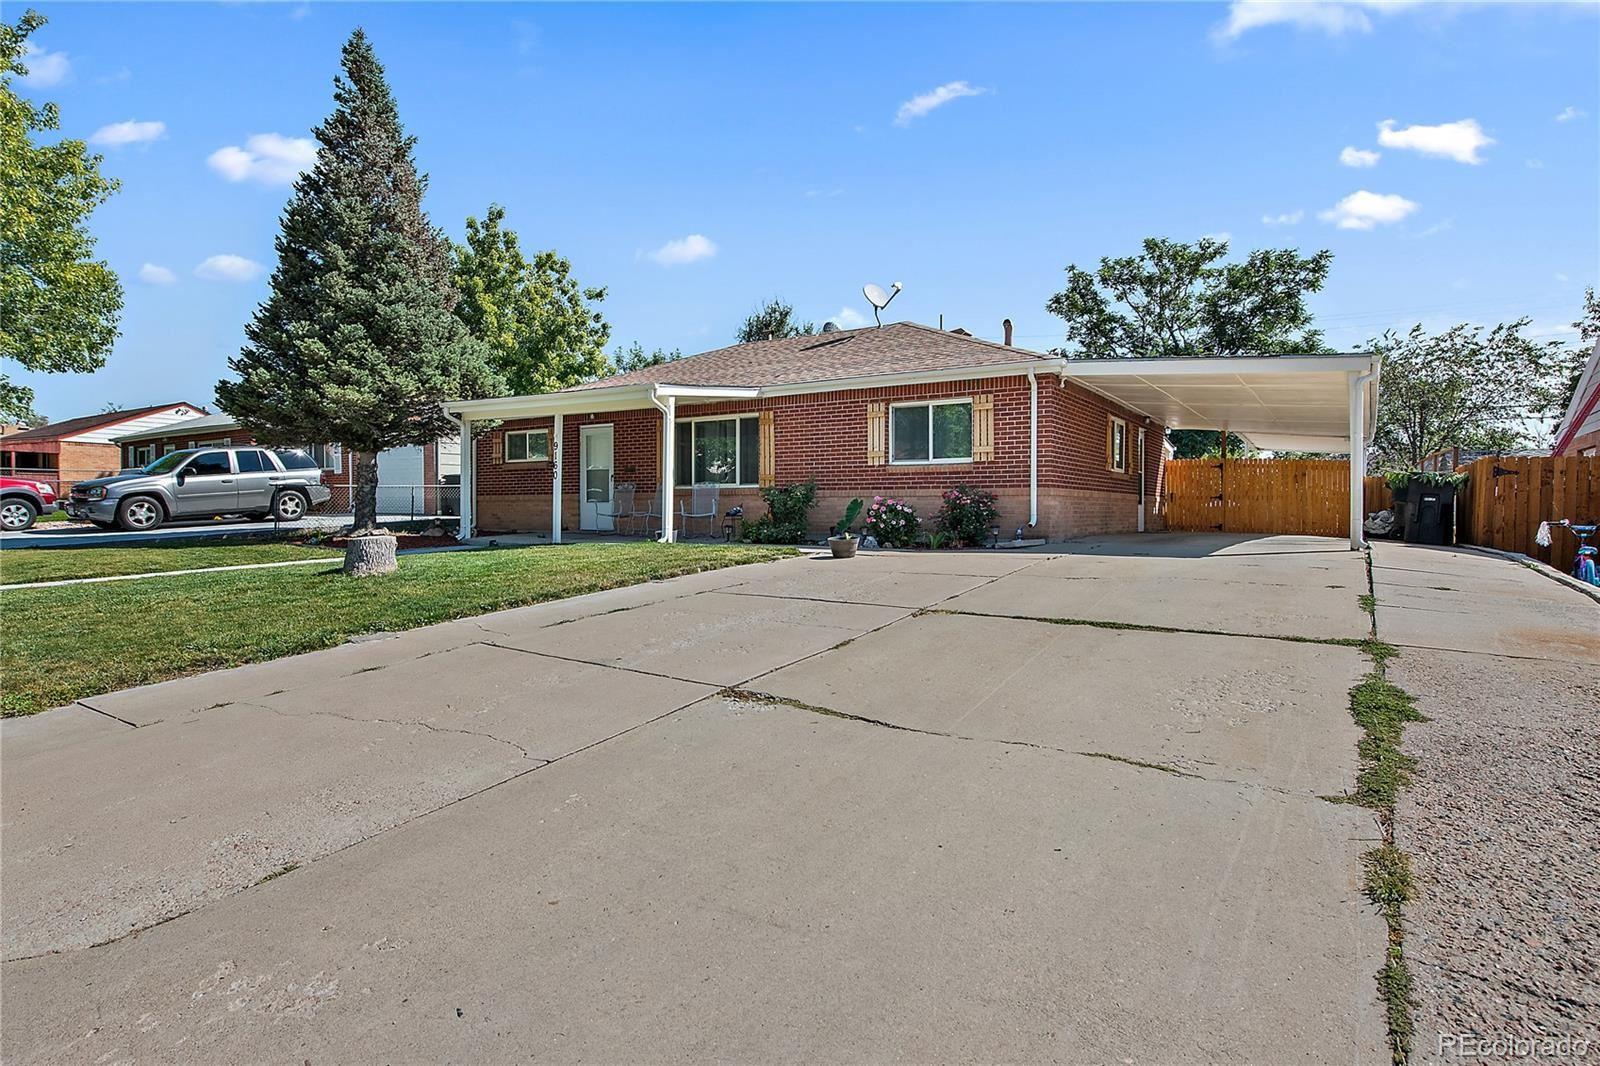 Photo of 9160 High Street, Thornton, CO 80229 (MLS # 5662536)